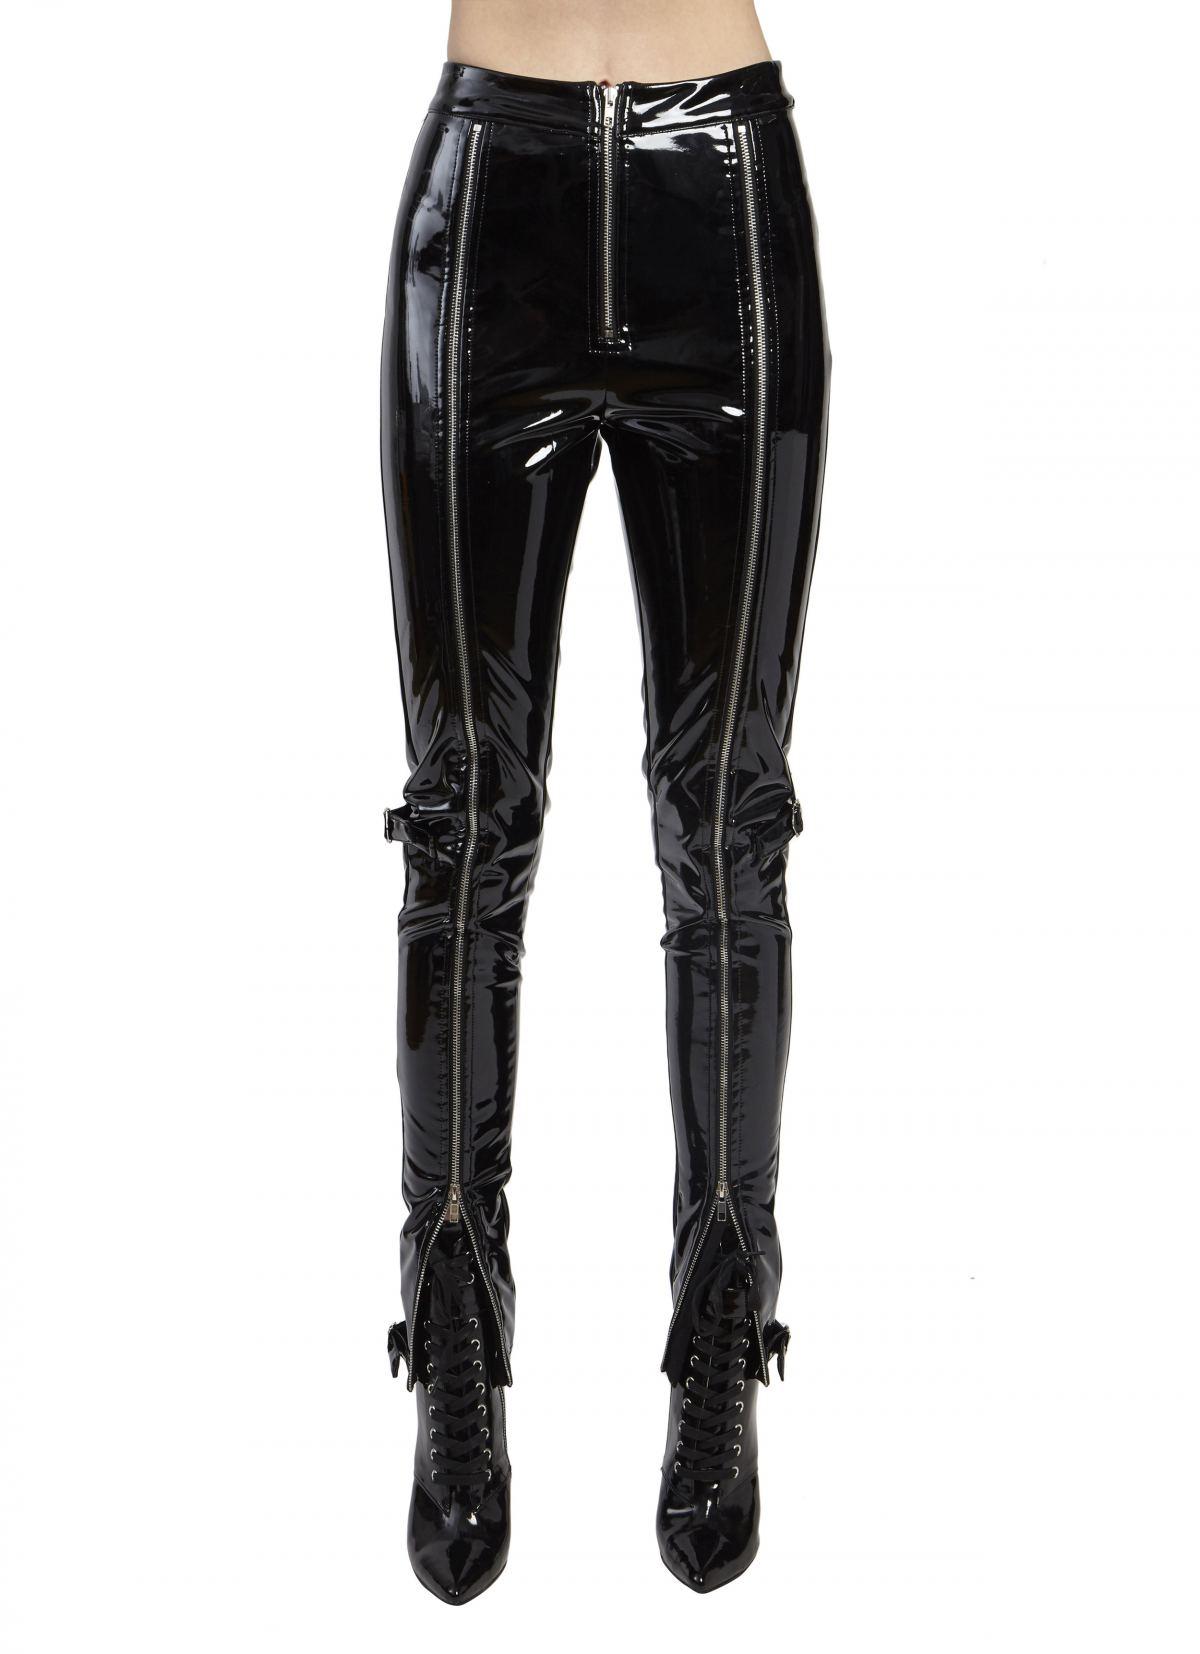 PATENT ZIPPER LEATHER PANTS by Danielle Guizio, available on danielleguiziony.com for $210 Kylie Jenner Pants SIMILAR PRODUCT